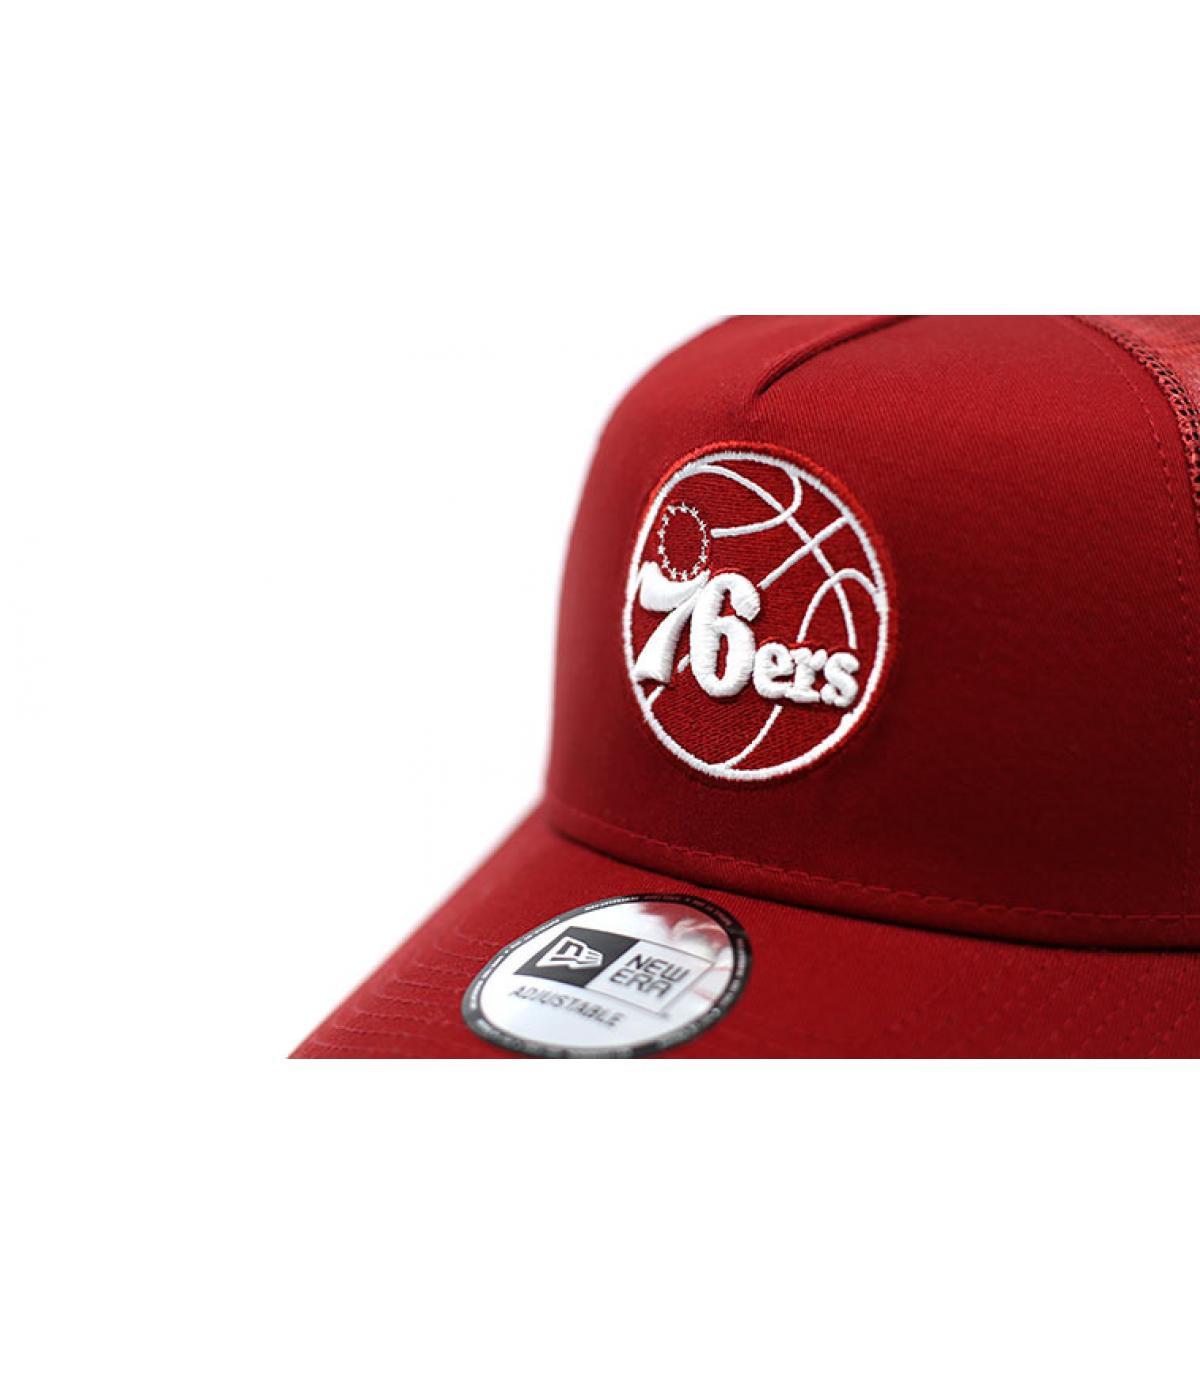 Détails Trucker NBA Ess 76ERS red - image 3